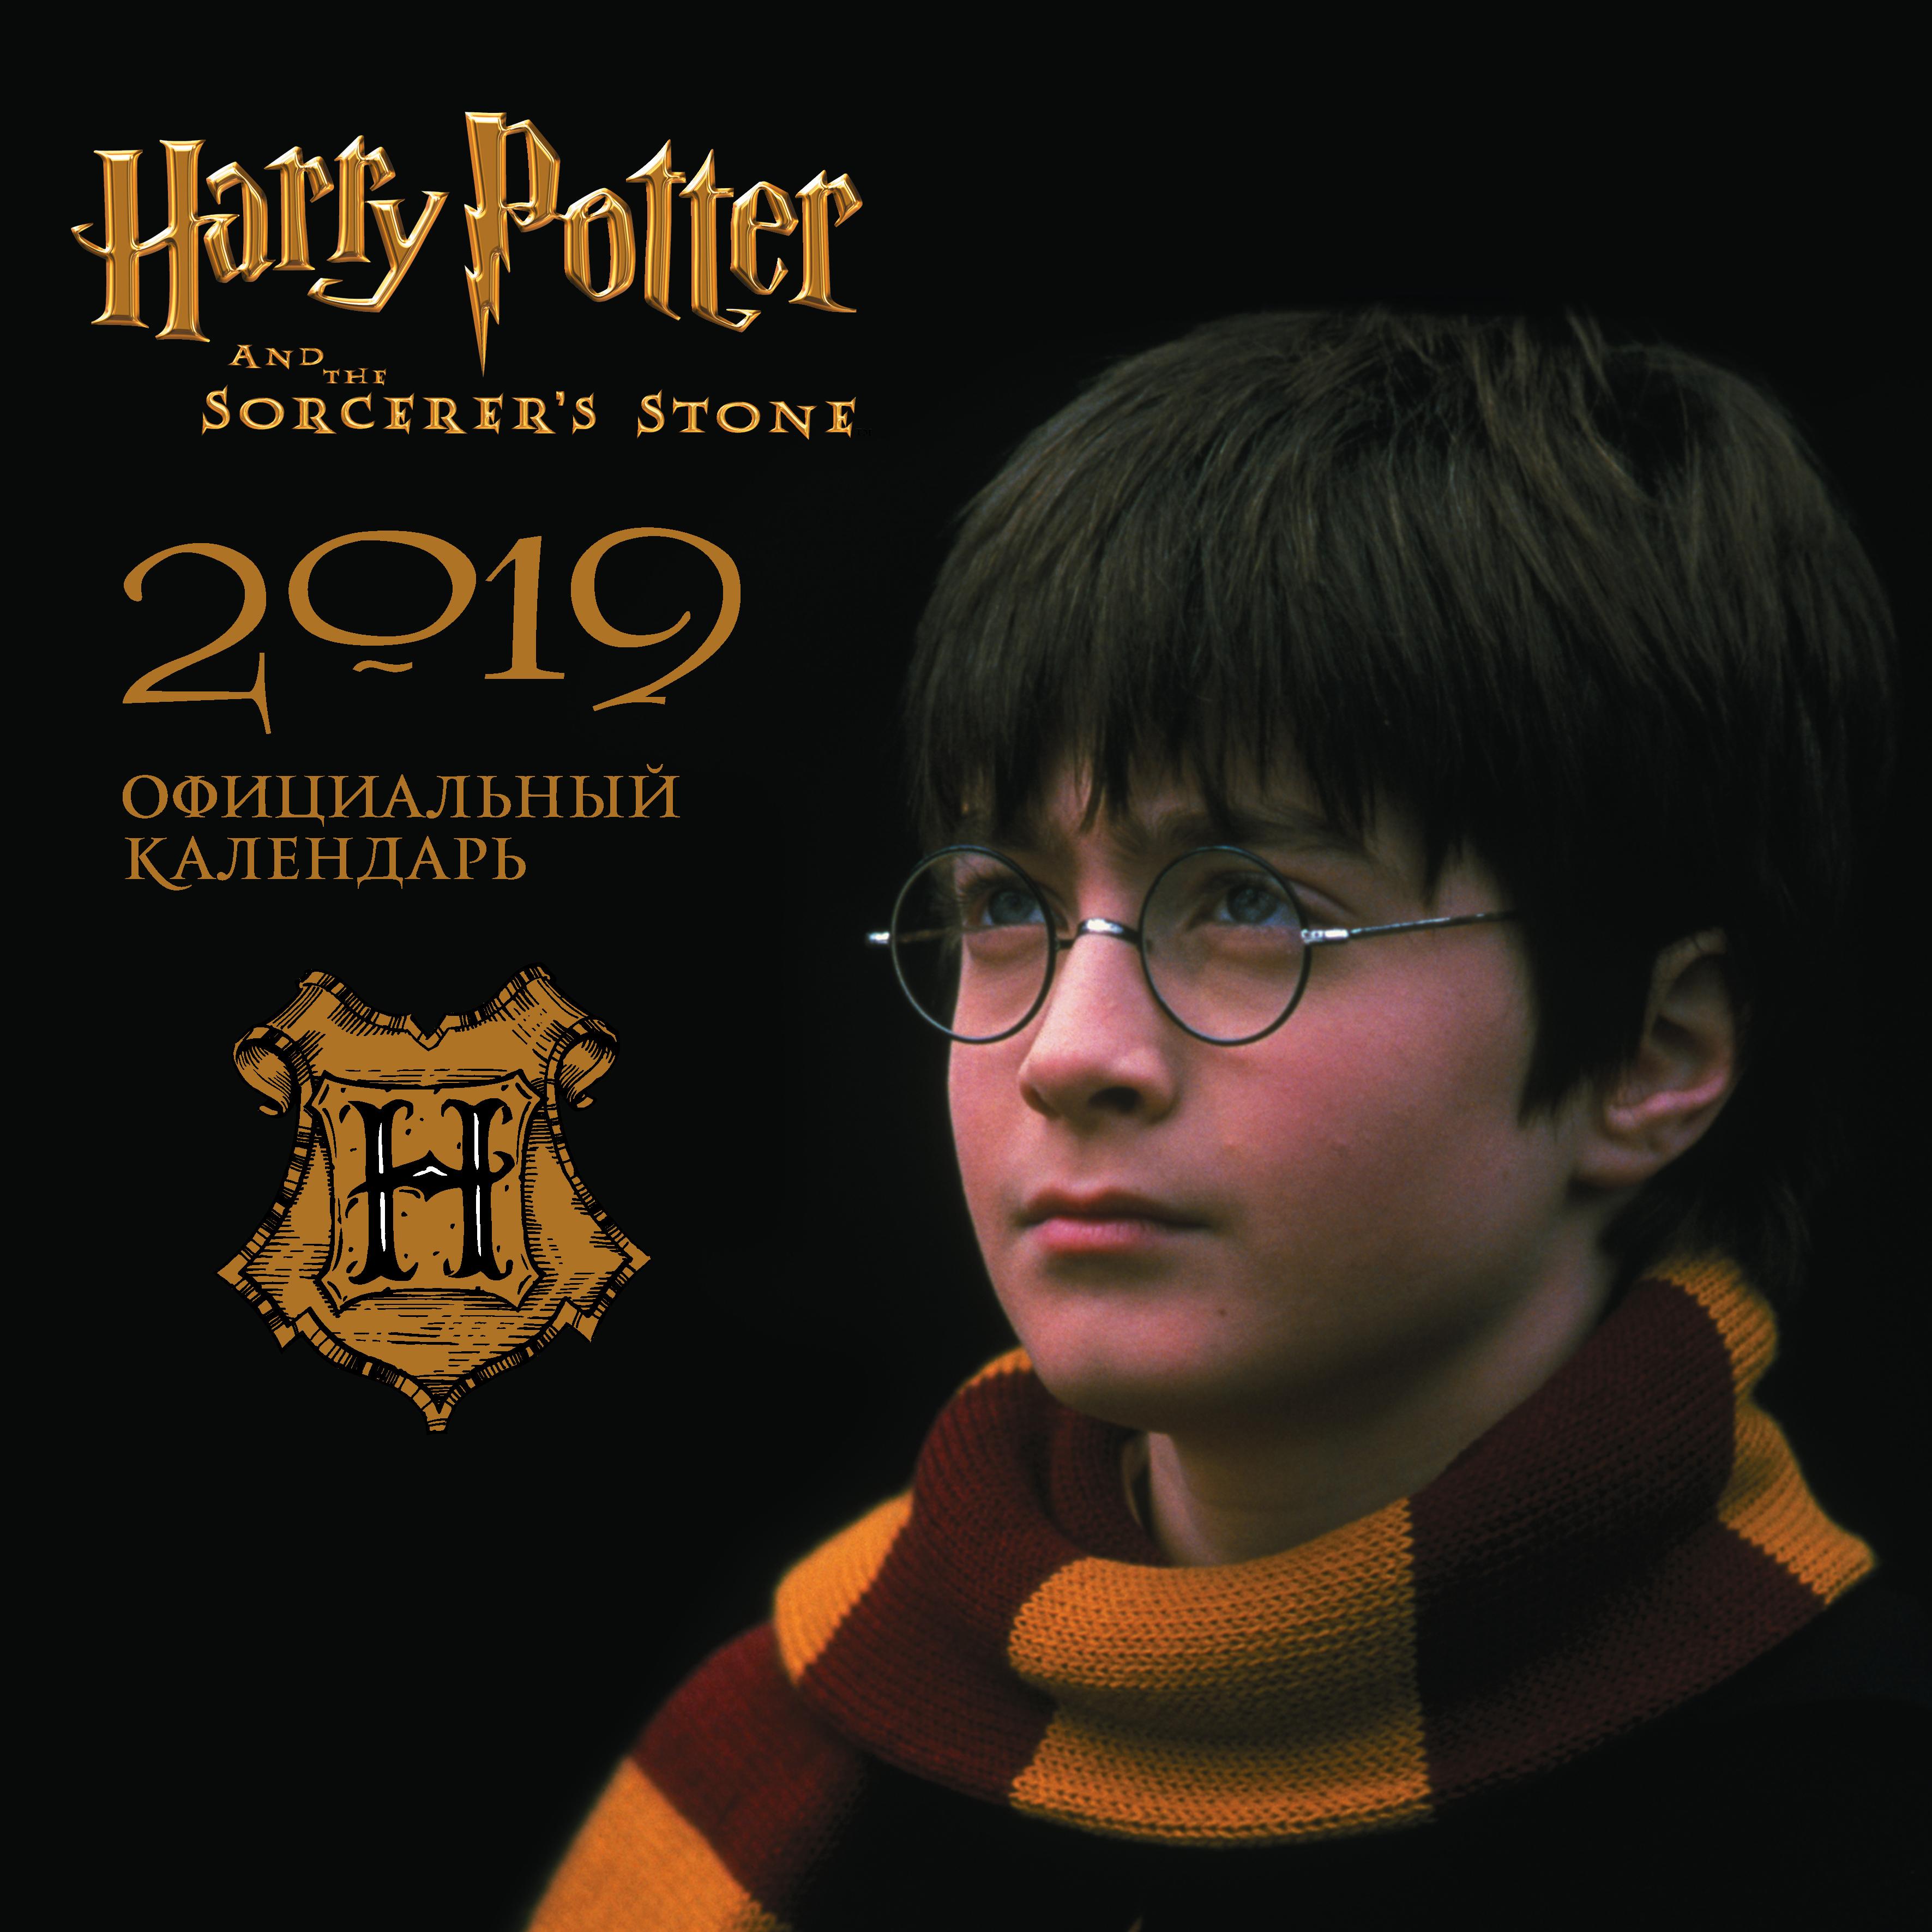 Гарри Поттер. Календарь настенный на 2019 год ISBN: 978-5-699-96535-9